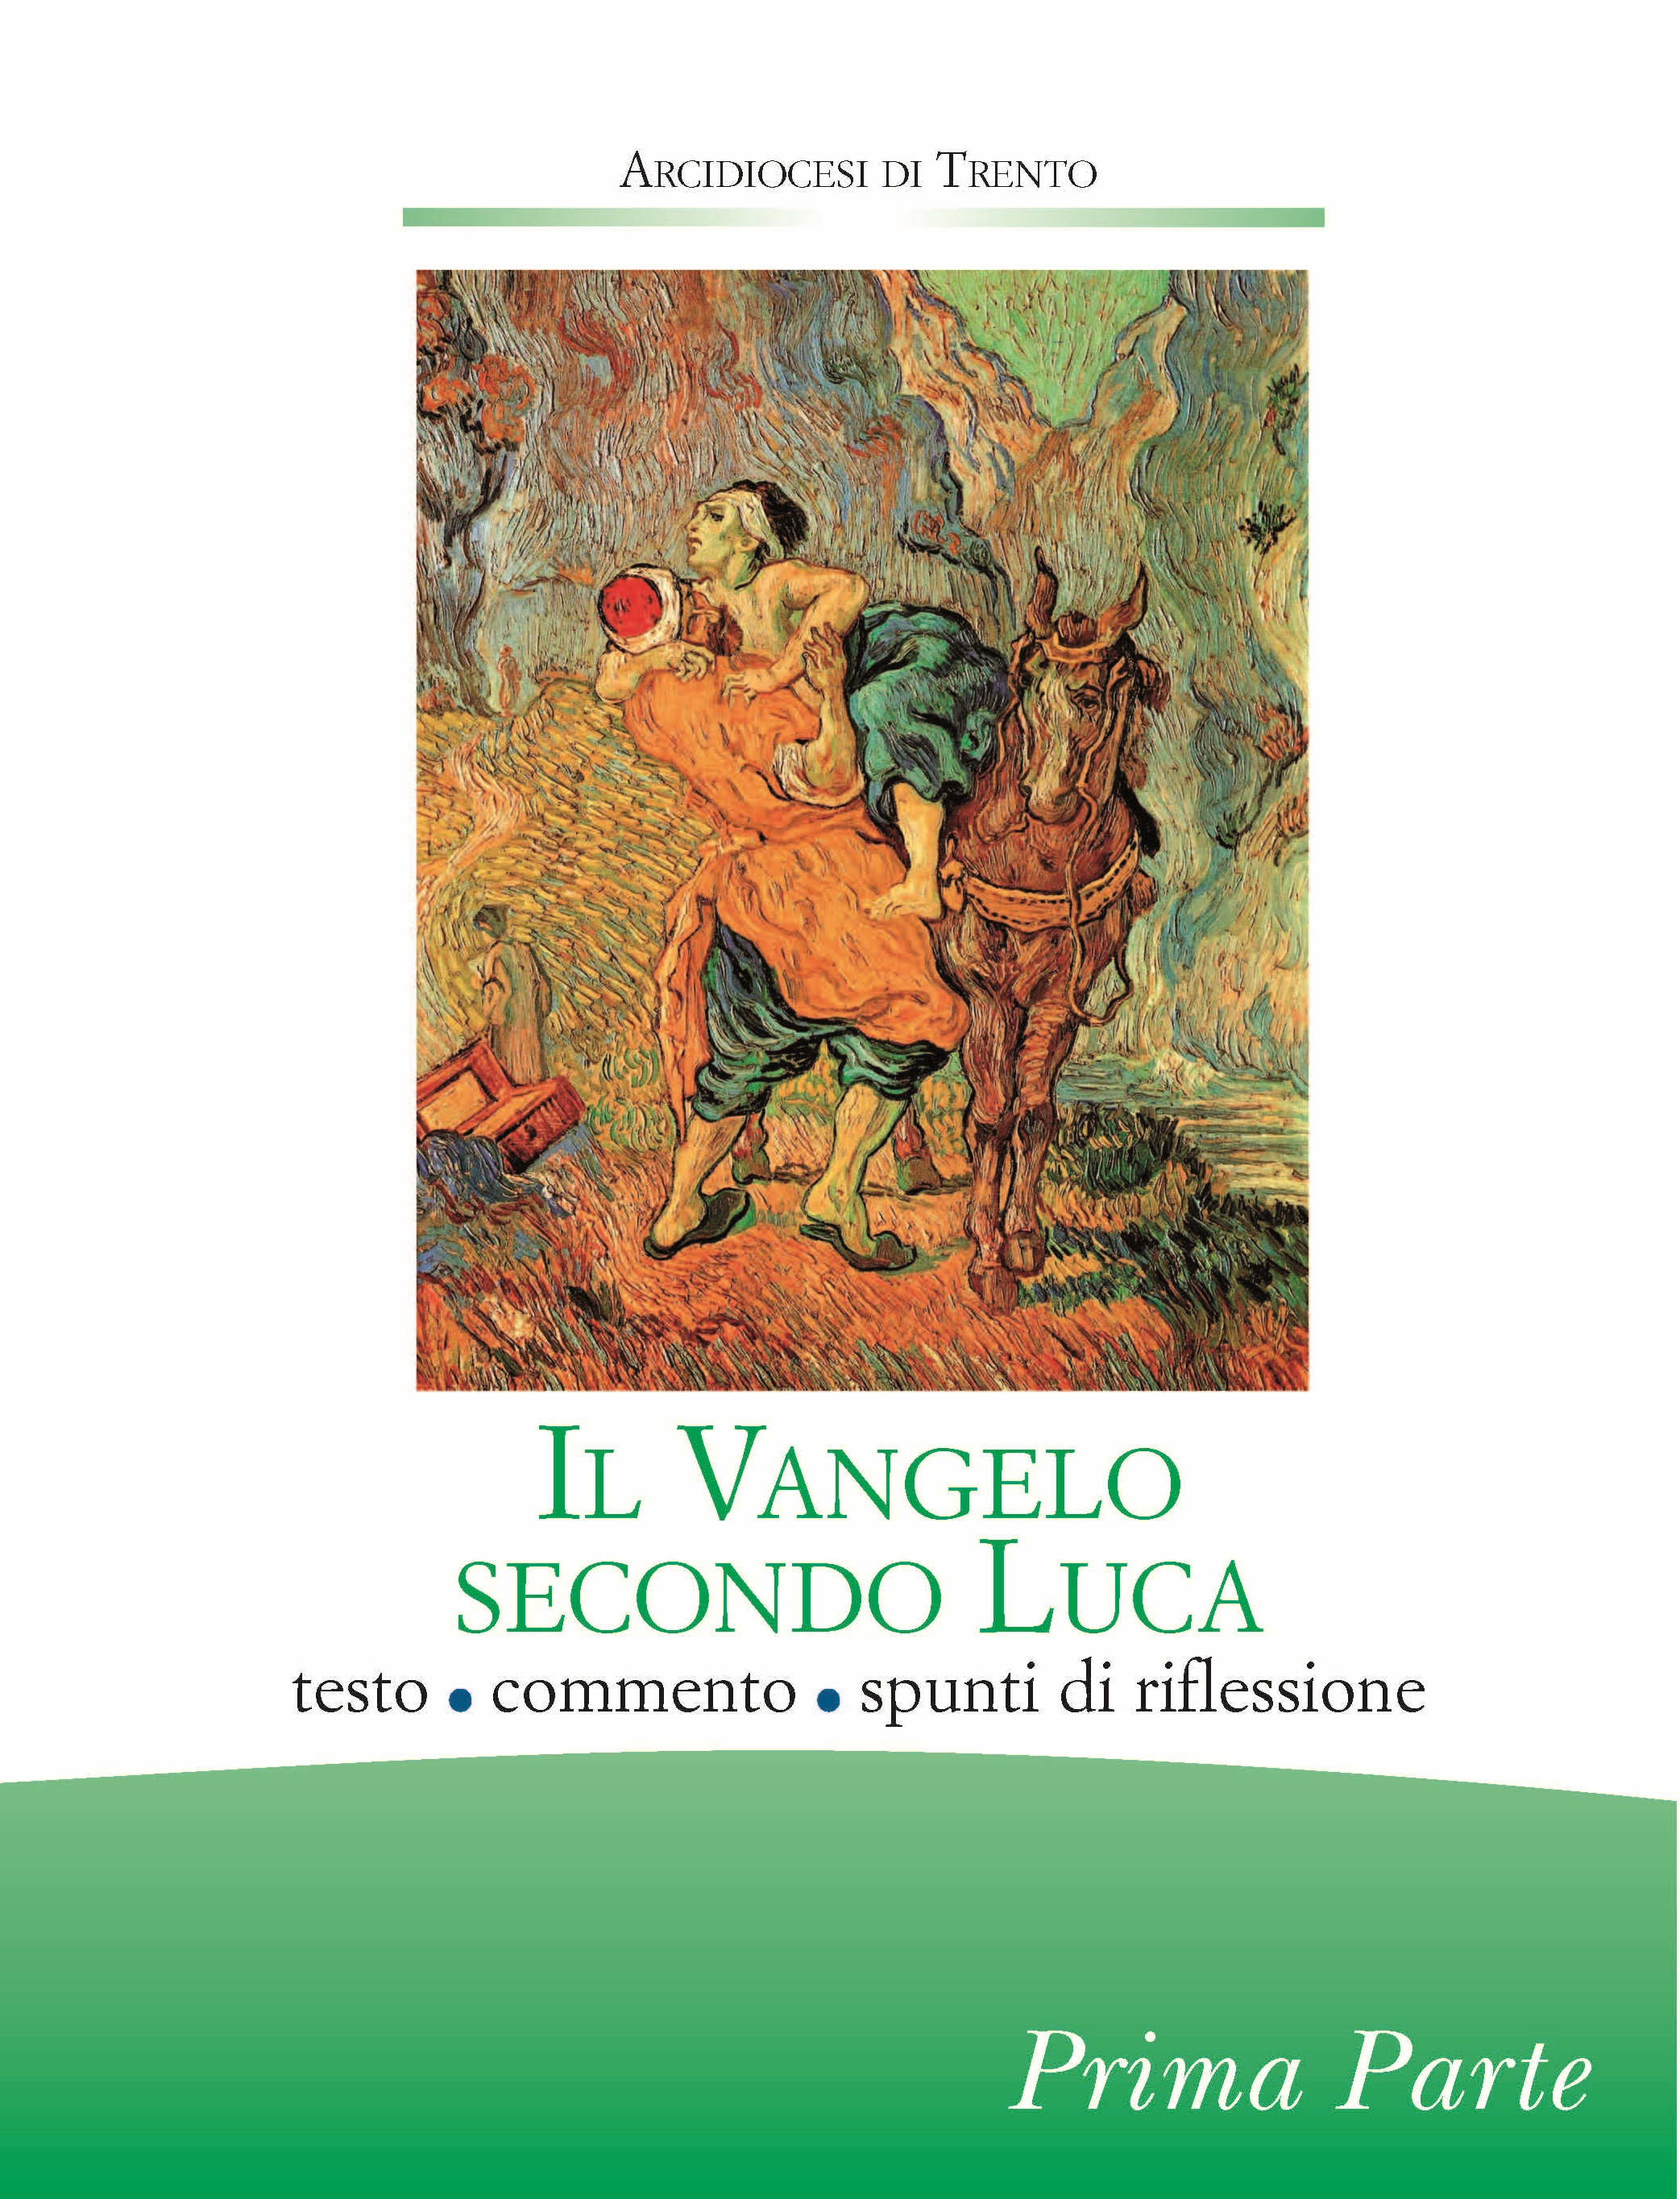 Schede Vangelo secondo Luca I parte